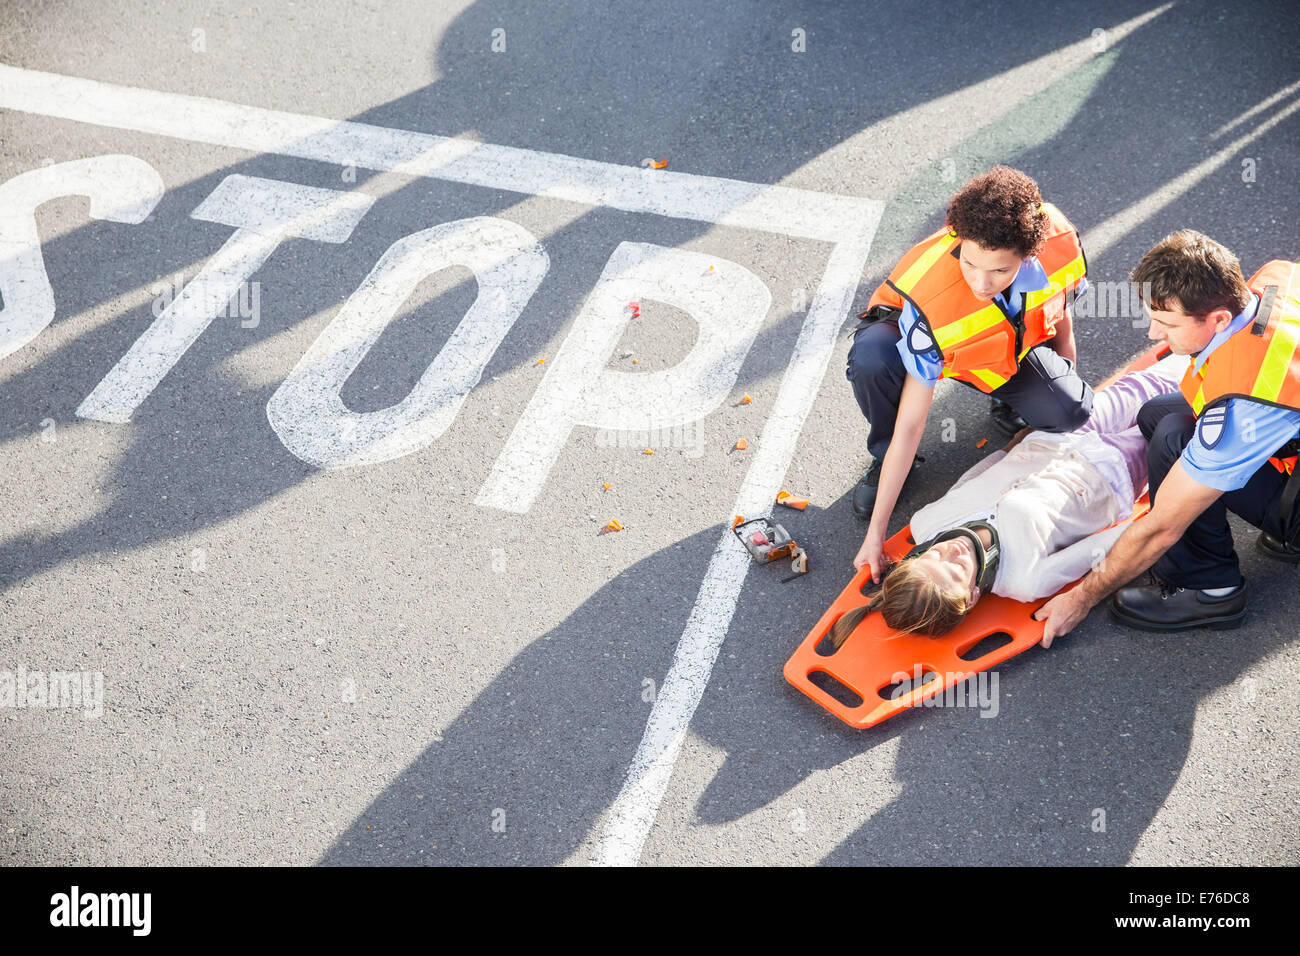 Paramedics examining injured girl on street - Stock Image